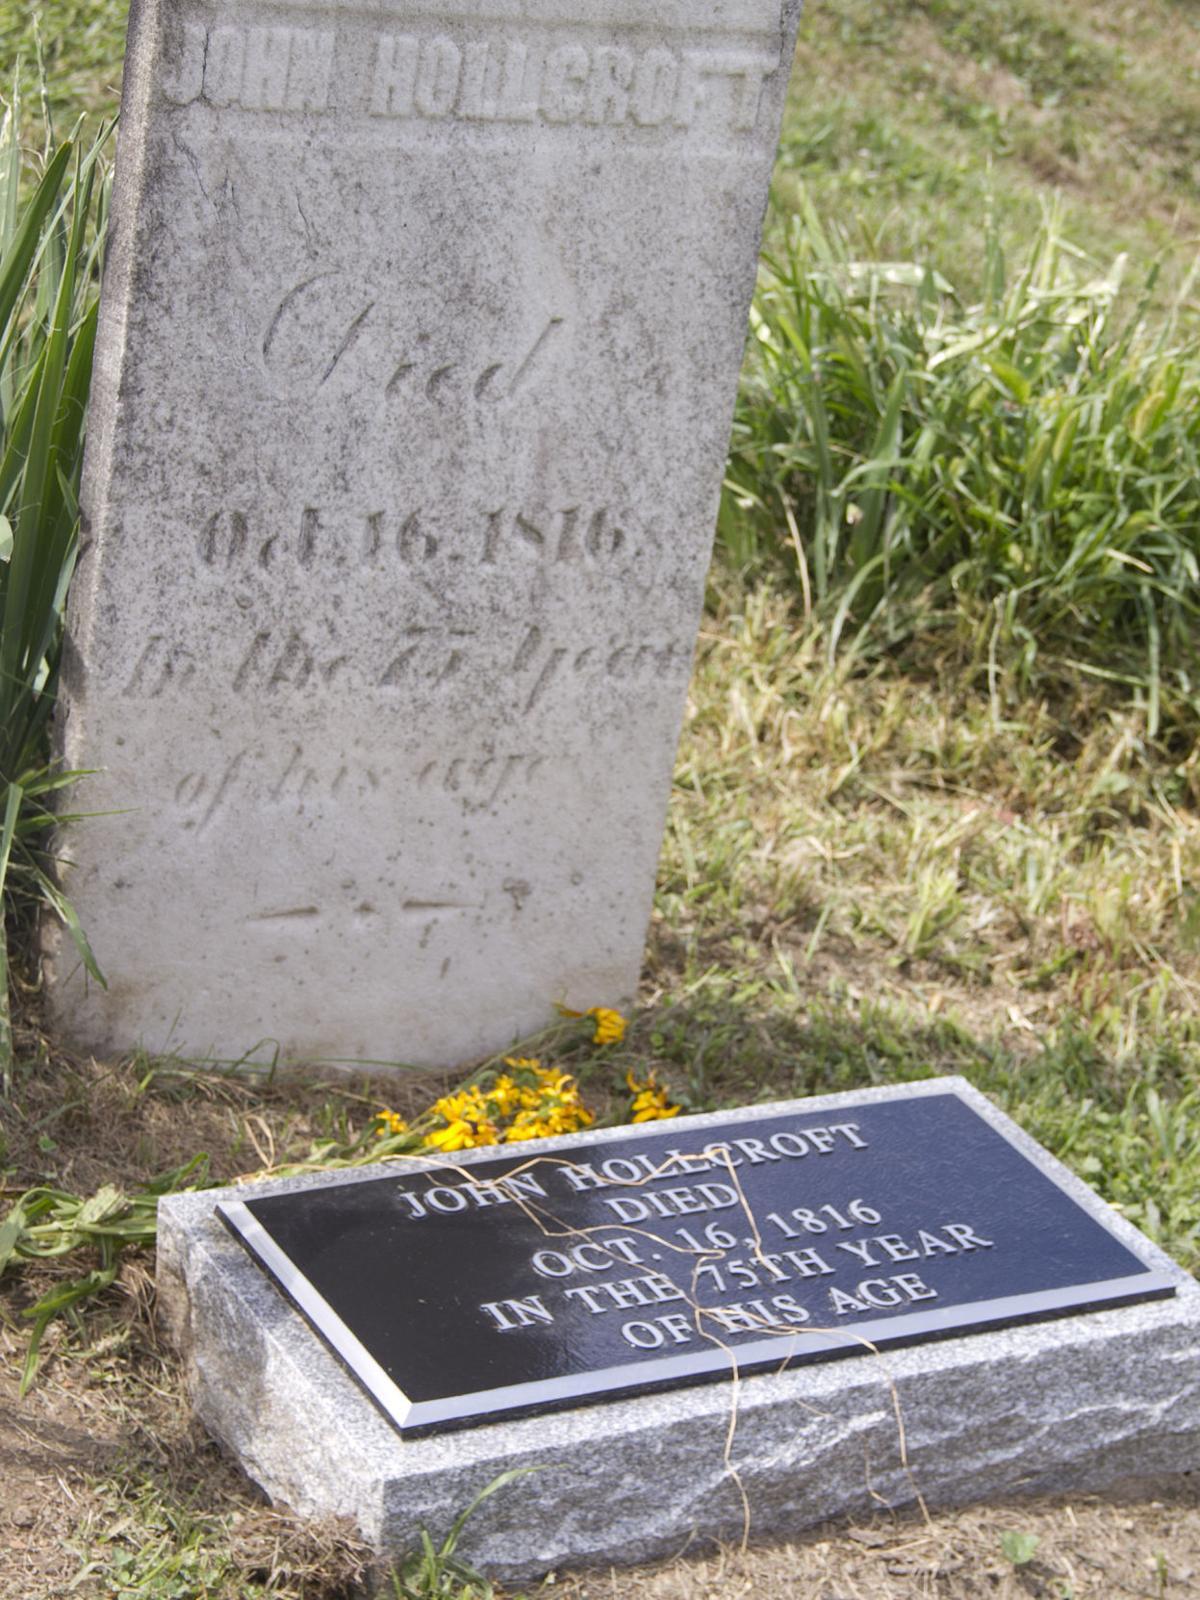 Hollcroft grave